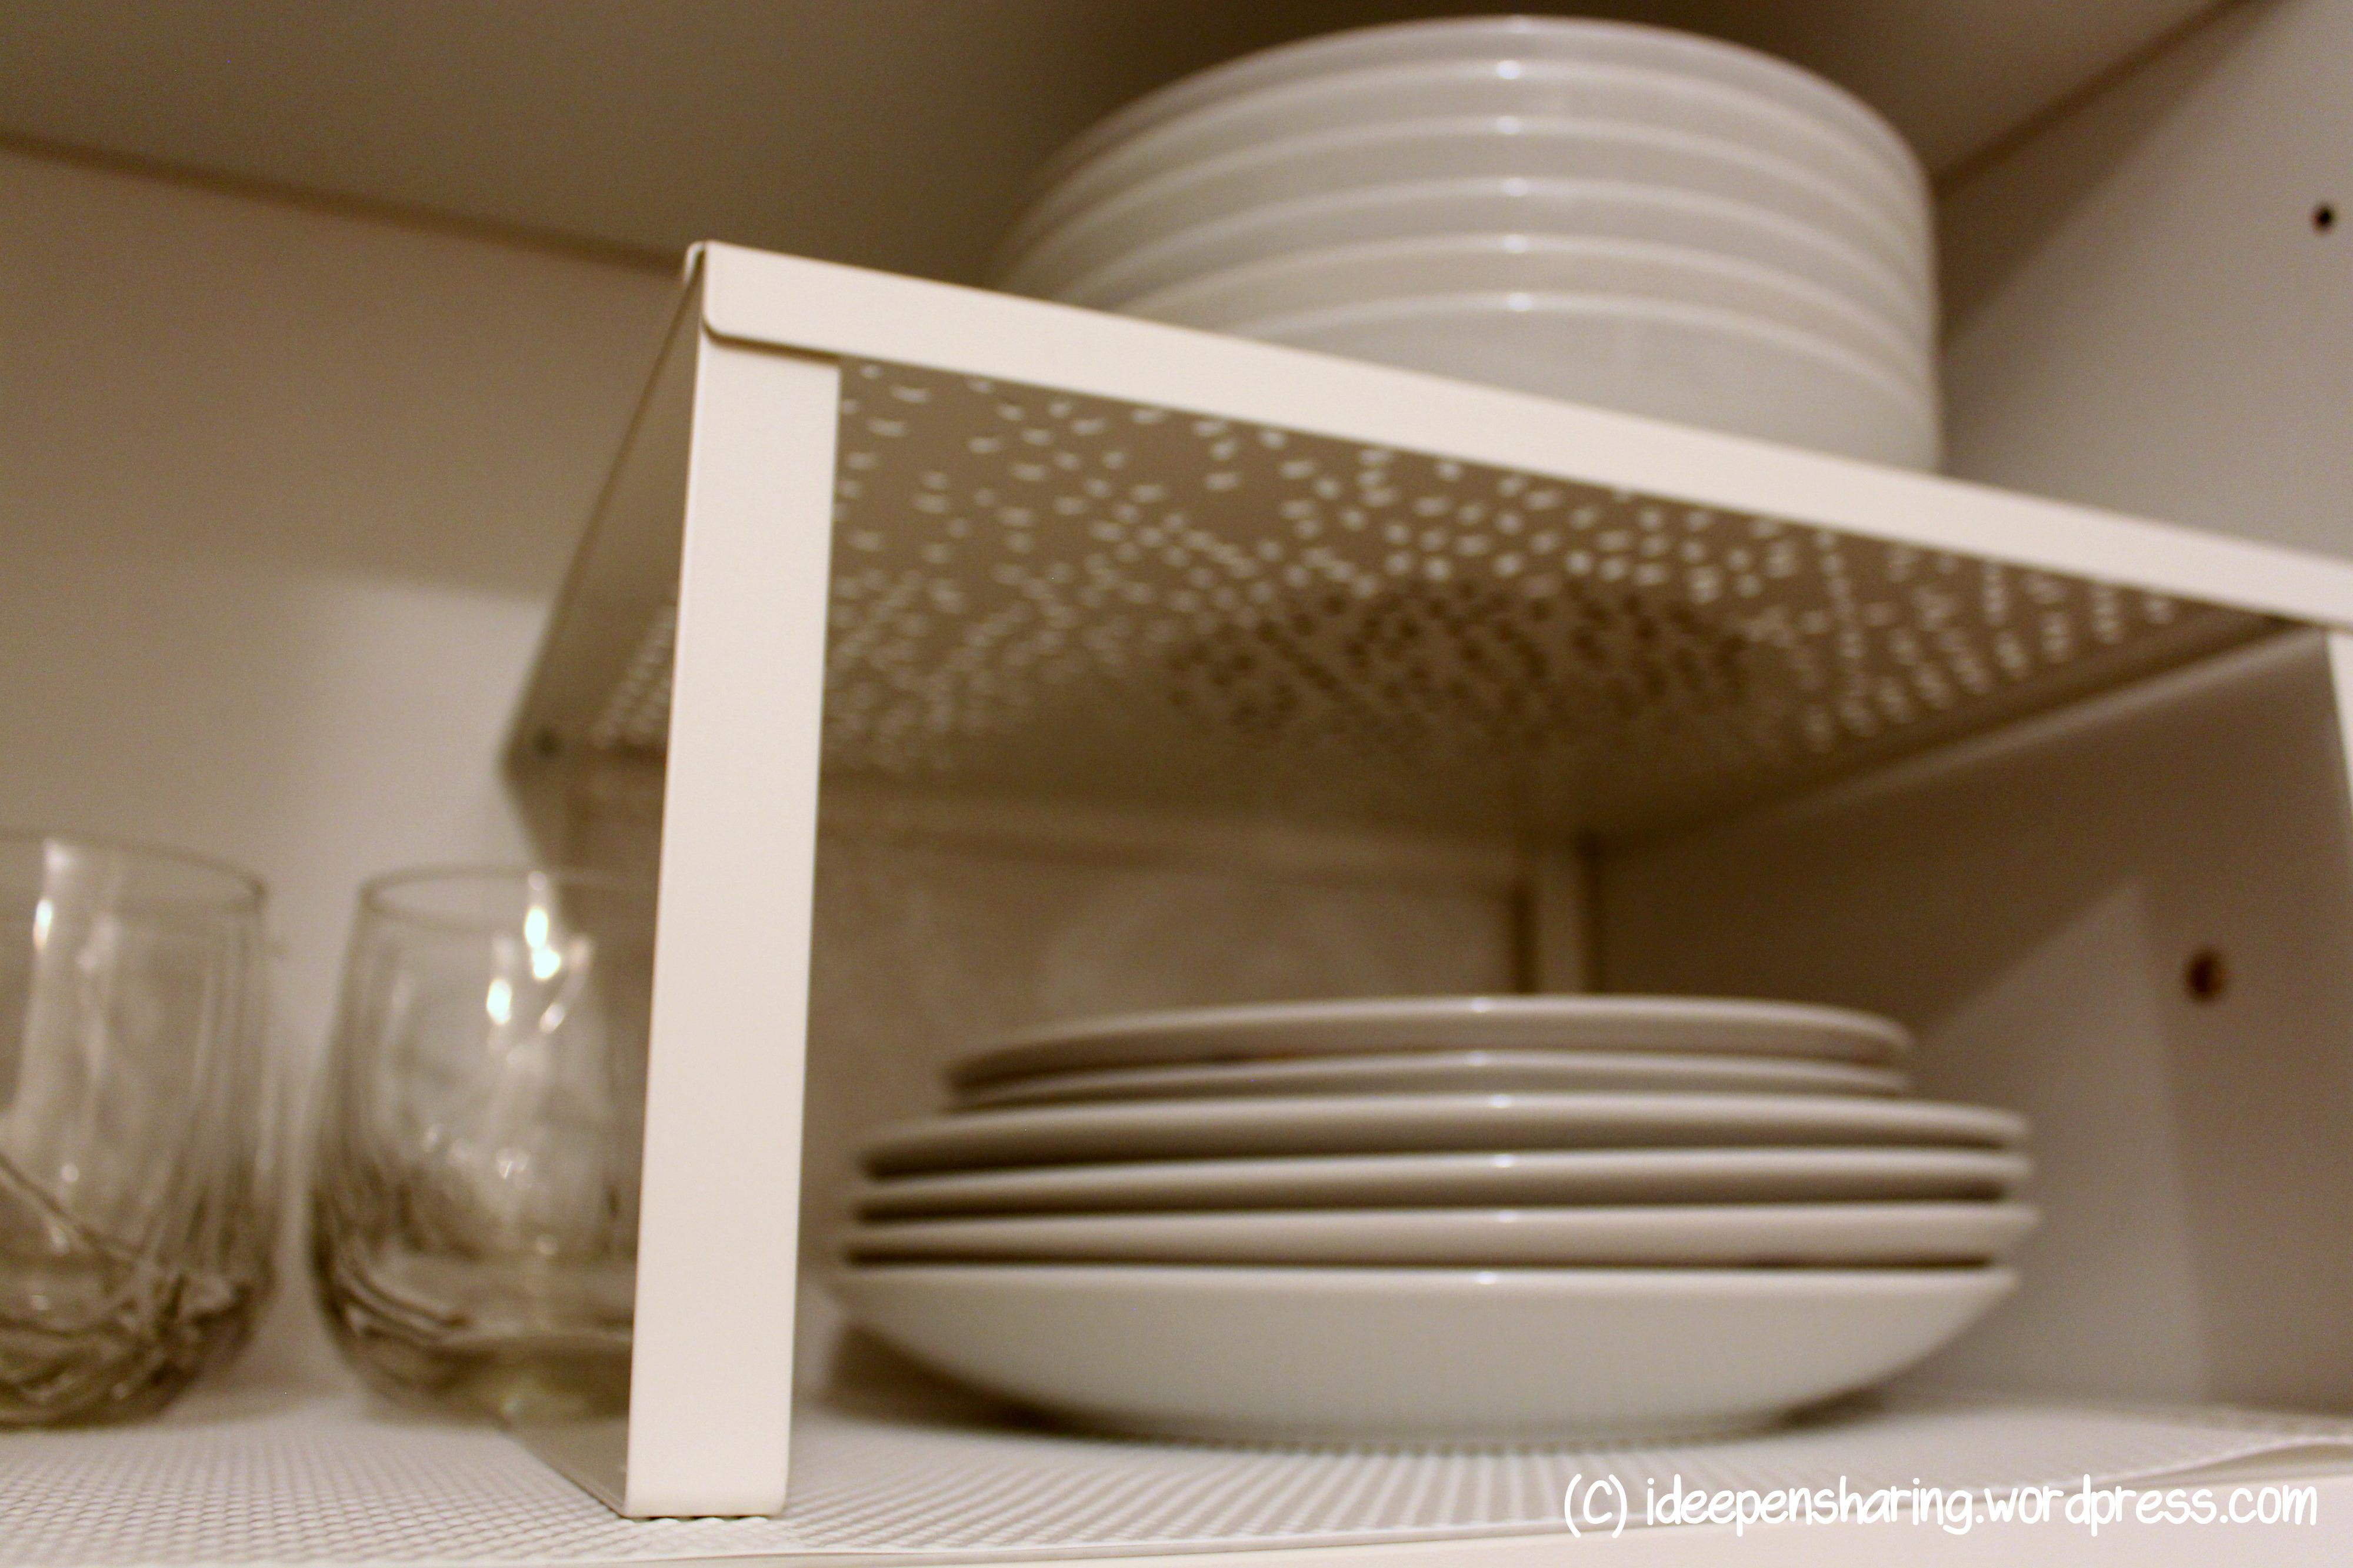 Pensili Cucina Ikea : Ante Pensili Cucina Ikea. Pensili Cucina Ikea  #473014 4000 2666 Come Appendere Pensili Cucina Ikea